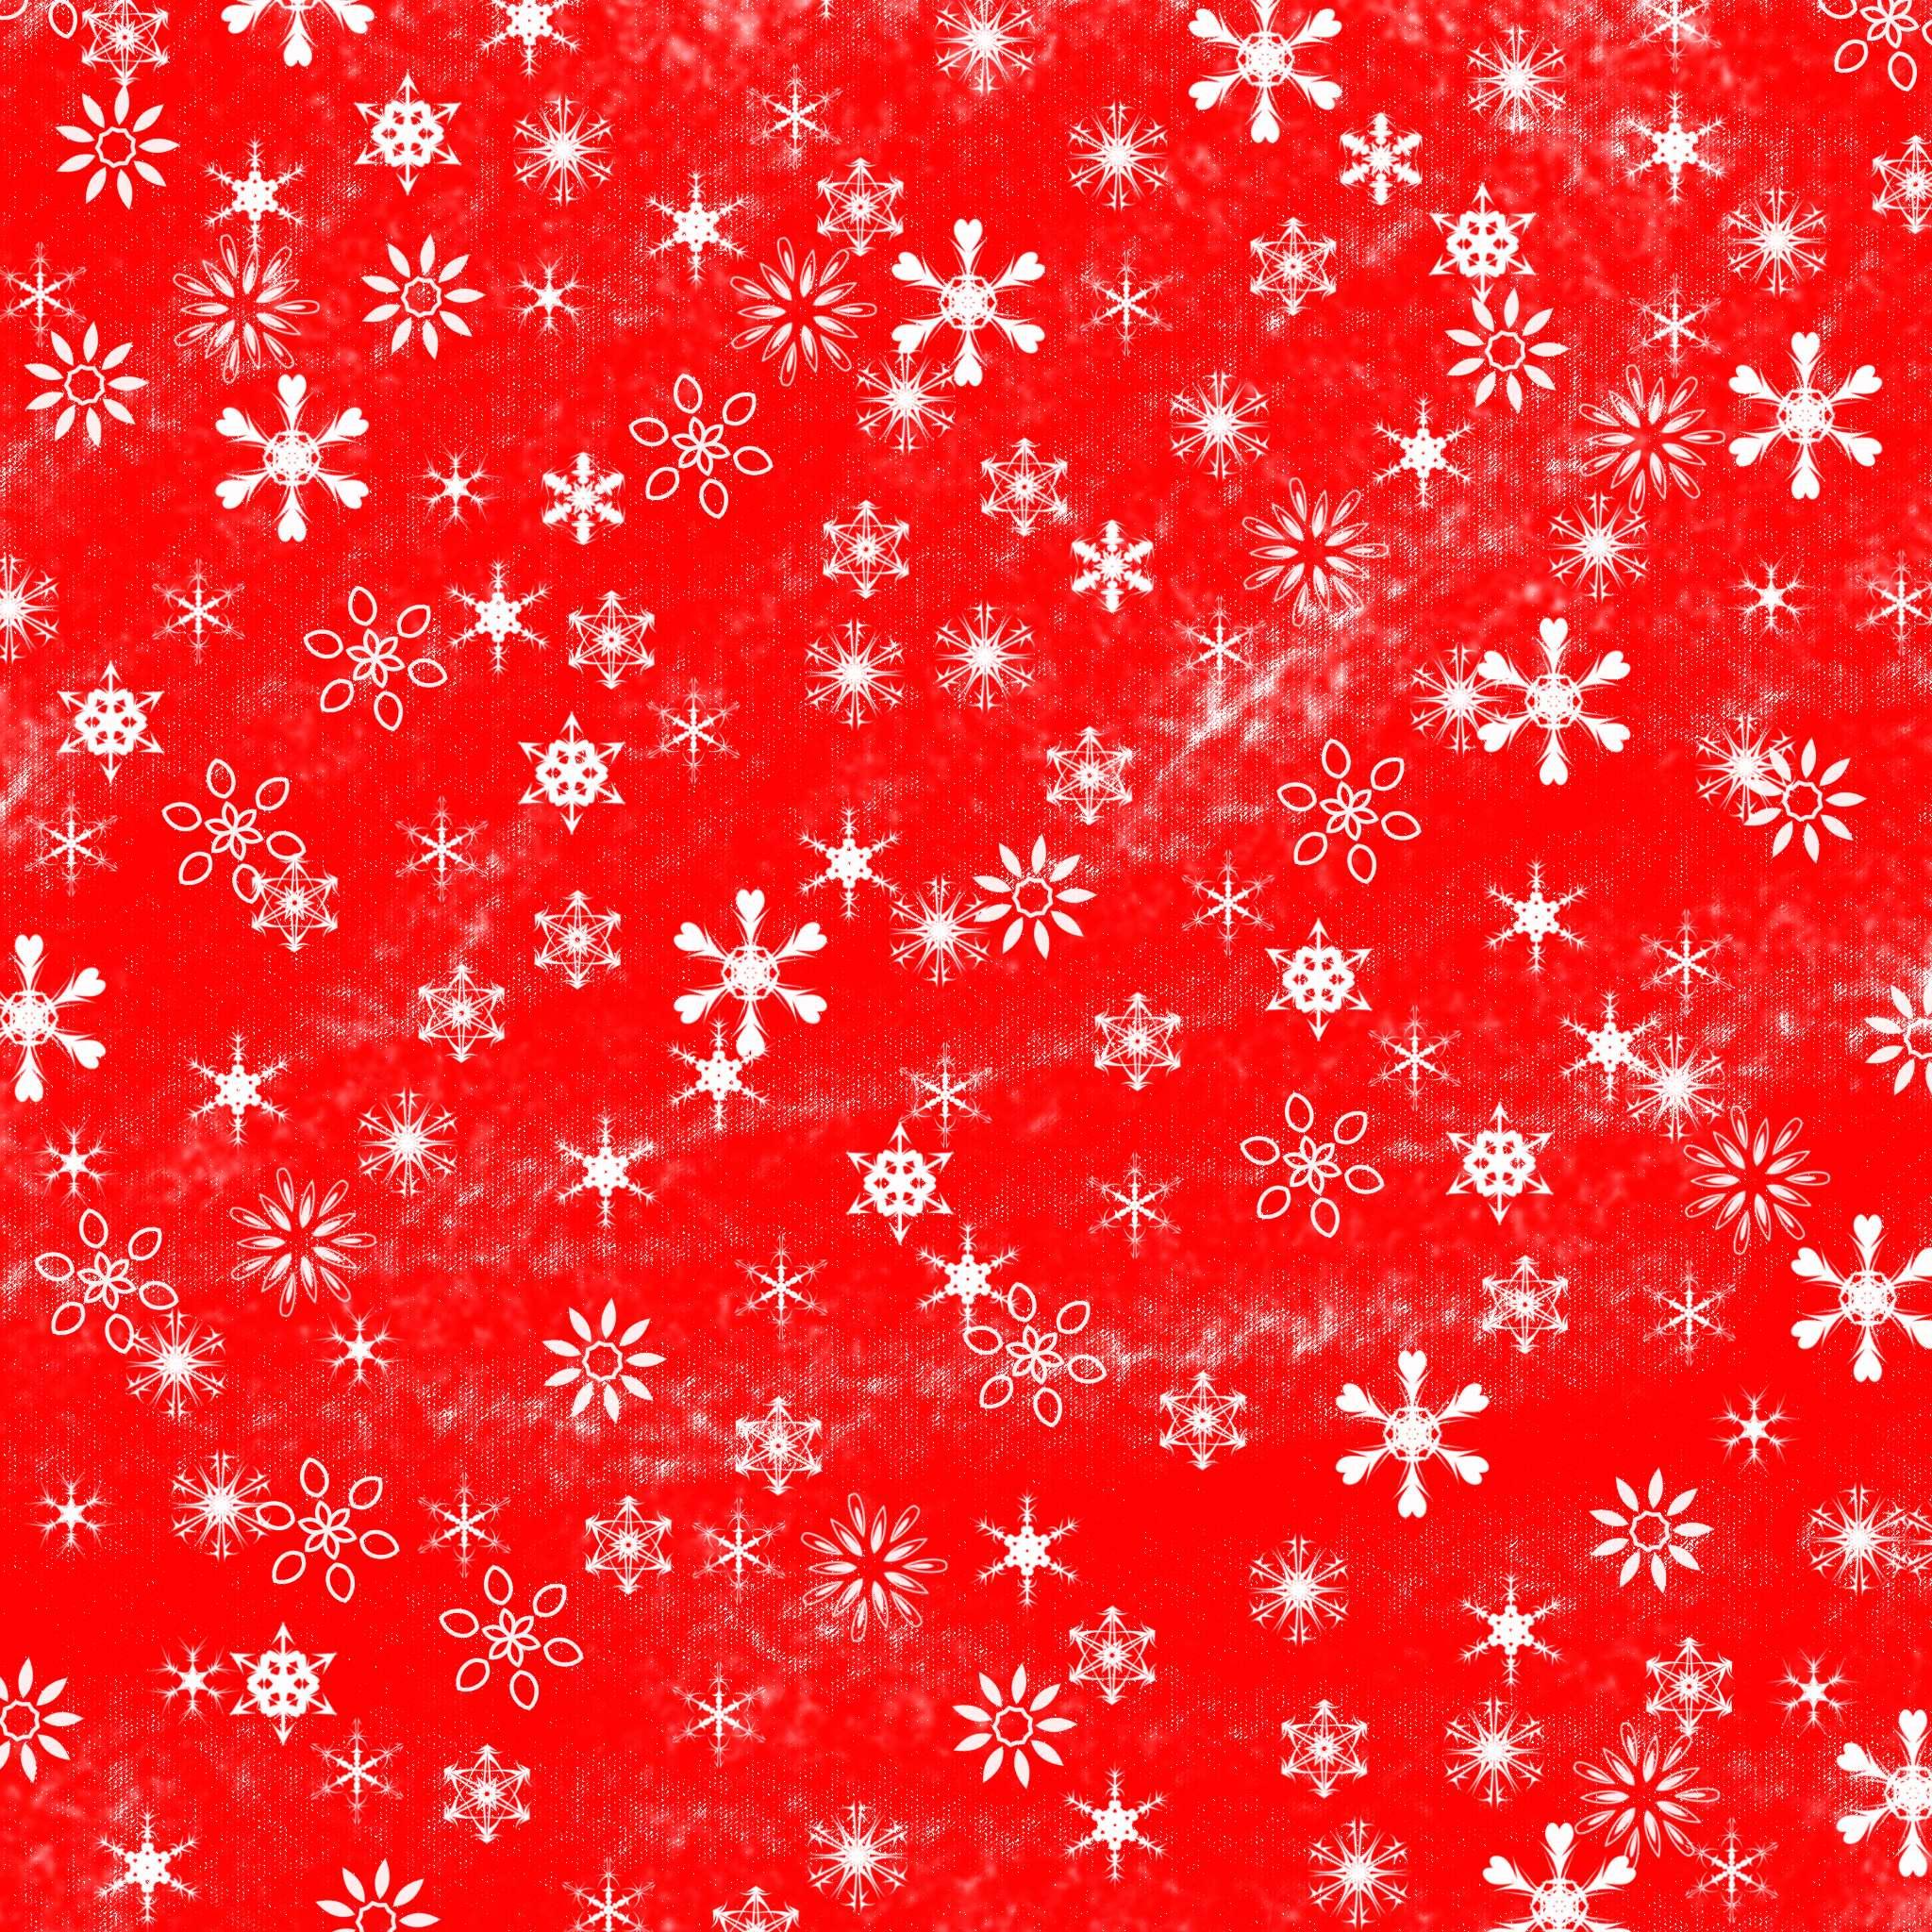 Free Printable Christmas Backgrounds – Festival Collections - Free Printable Christmas Backgrounds